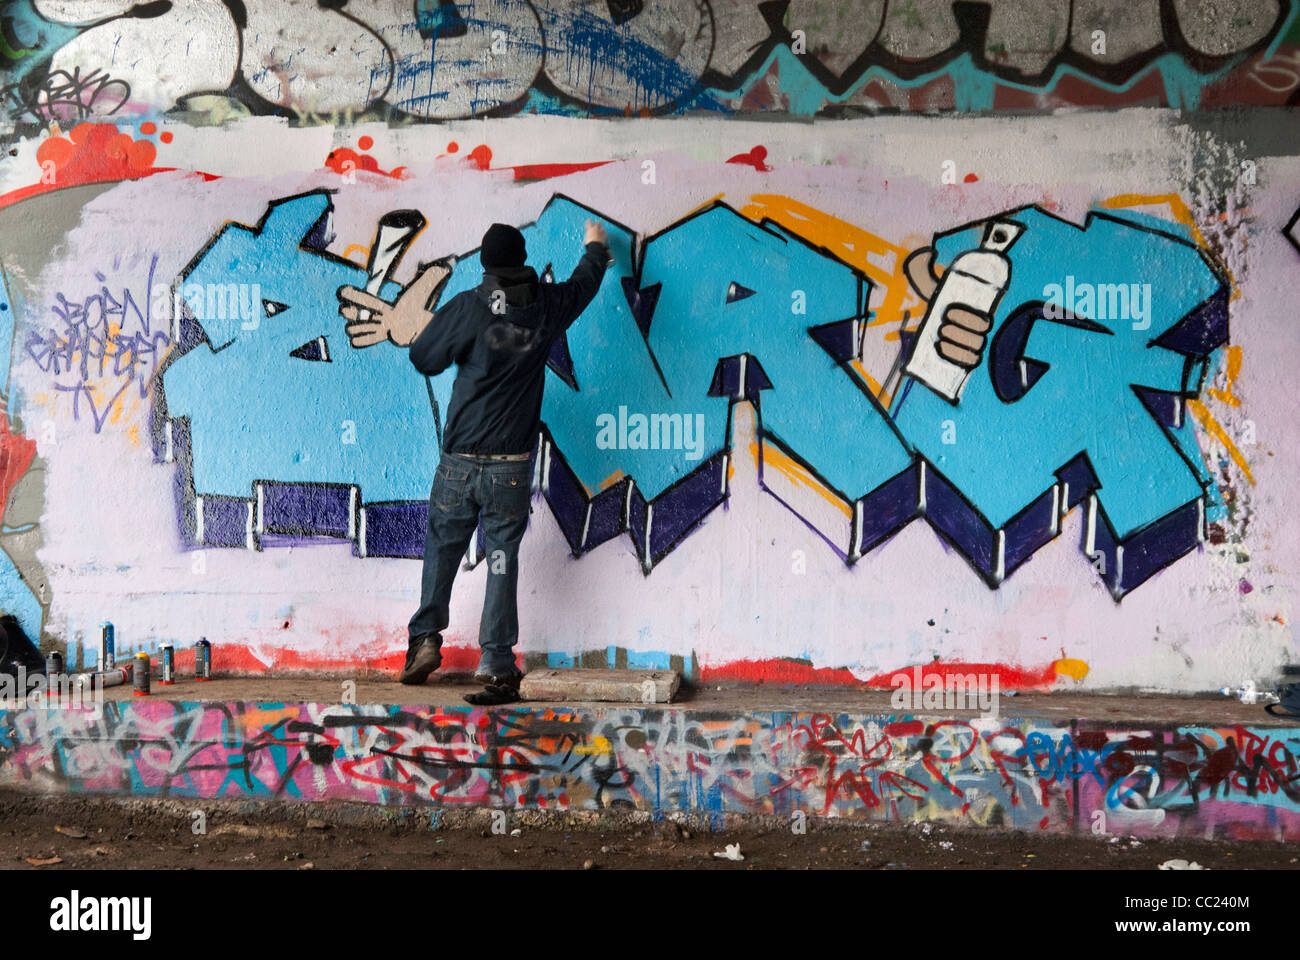 Tagging Hooded Young Man Spray Painting Graffiti Under Bridge